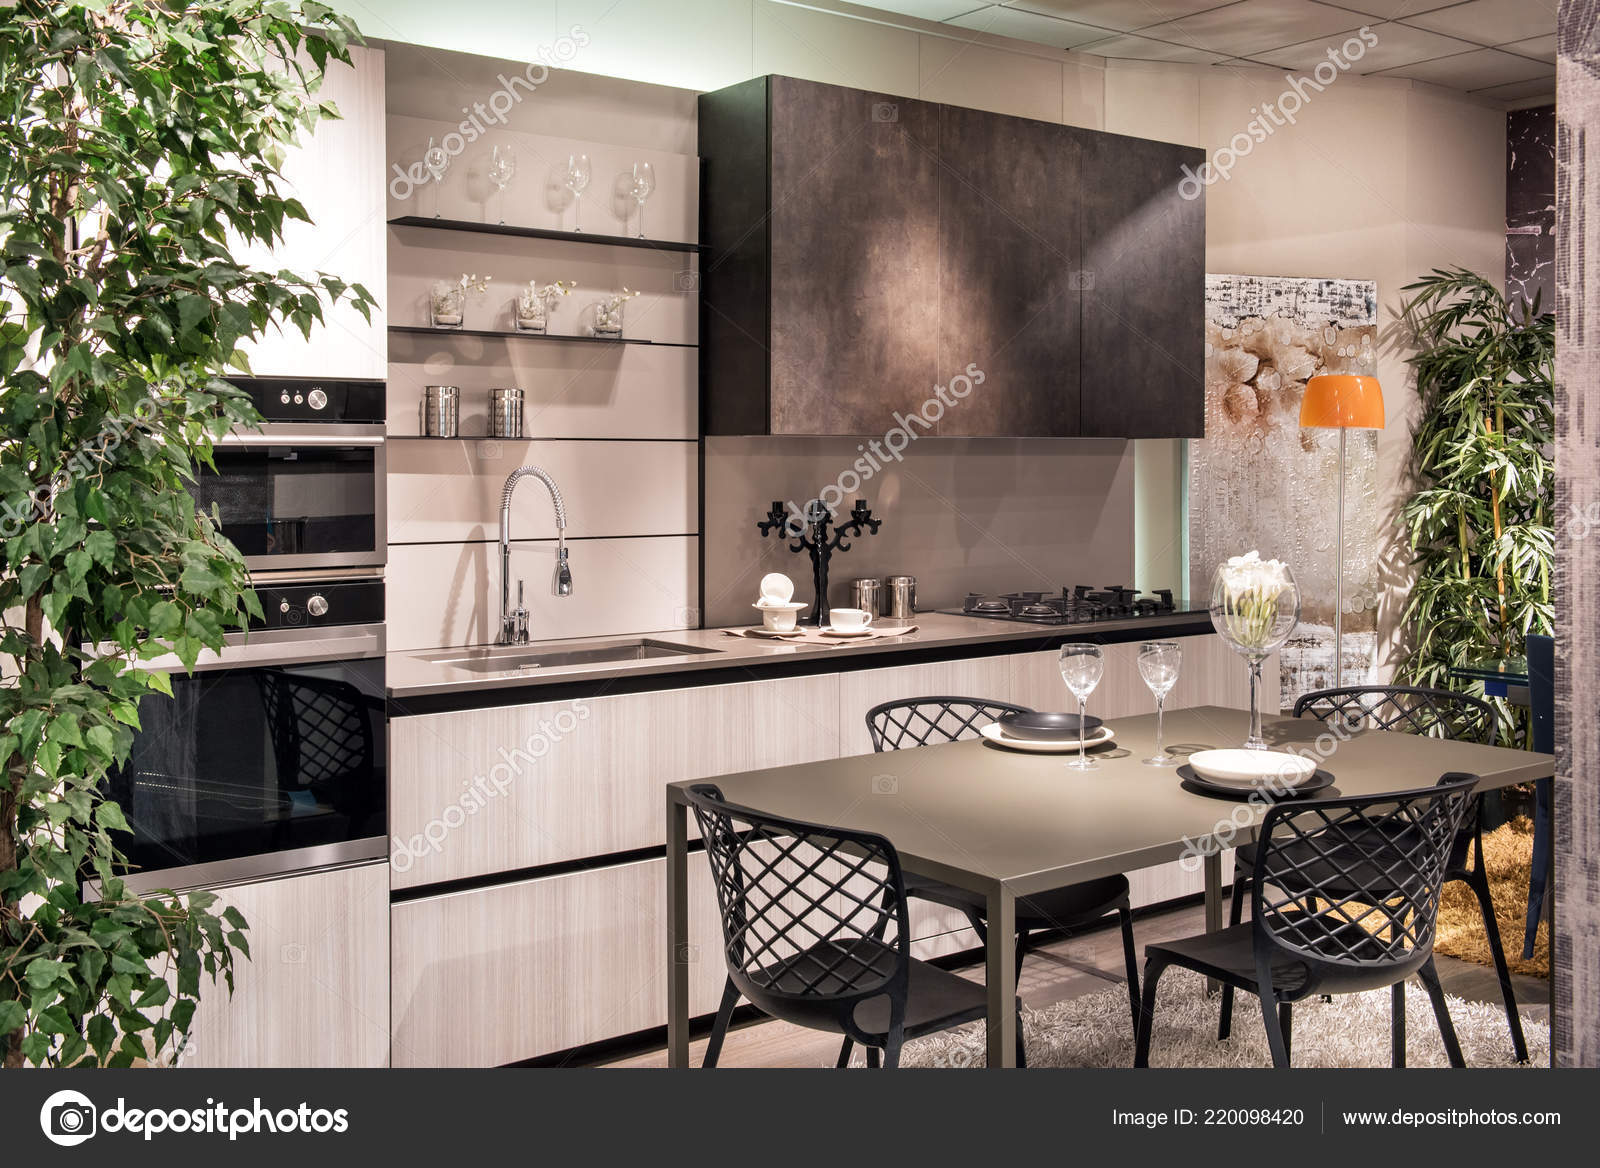 Moderno Elegante Equipada Zona Cocina Comedor Con Amueblada Armarios ...